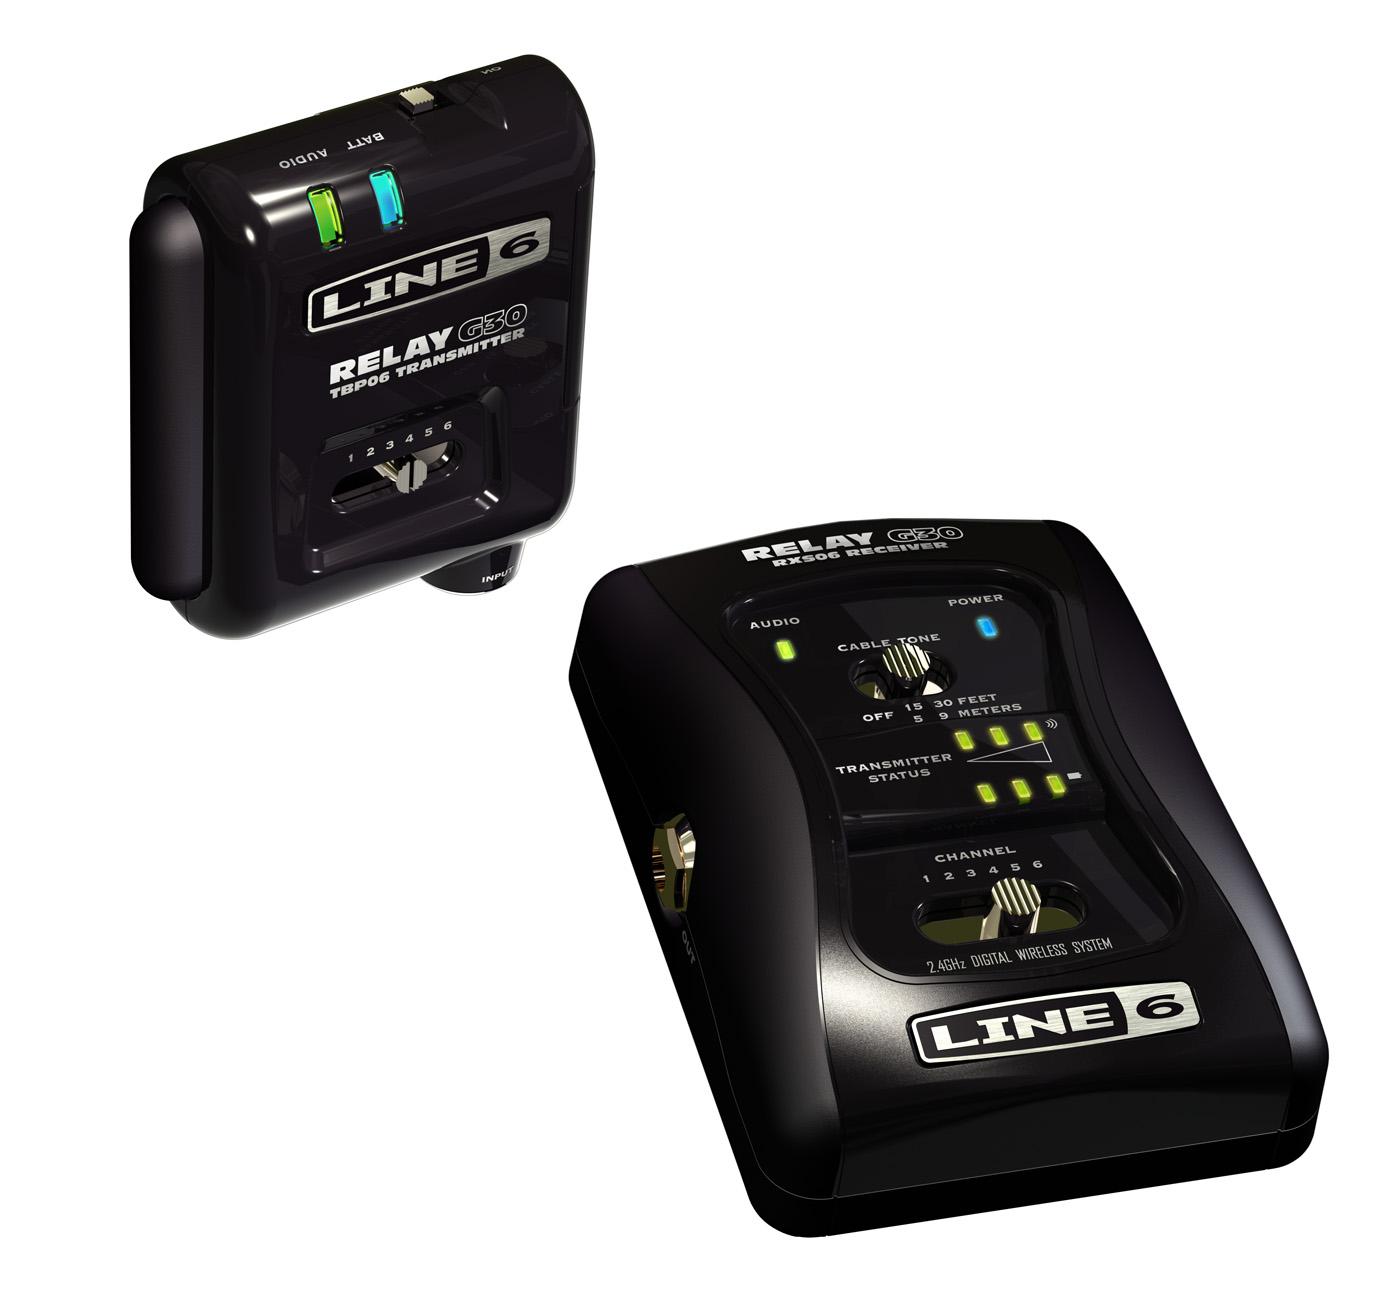 line 6 relay g30 wireless guitar system yamaha music london. Black Bedroom Furniture Sets. Home Design Ideas